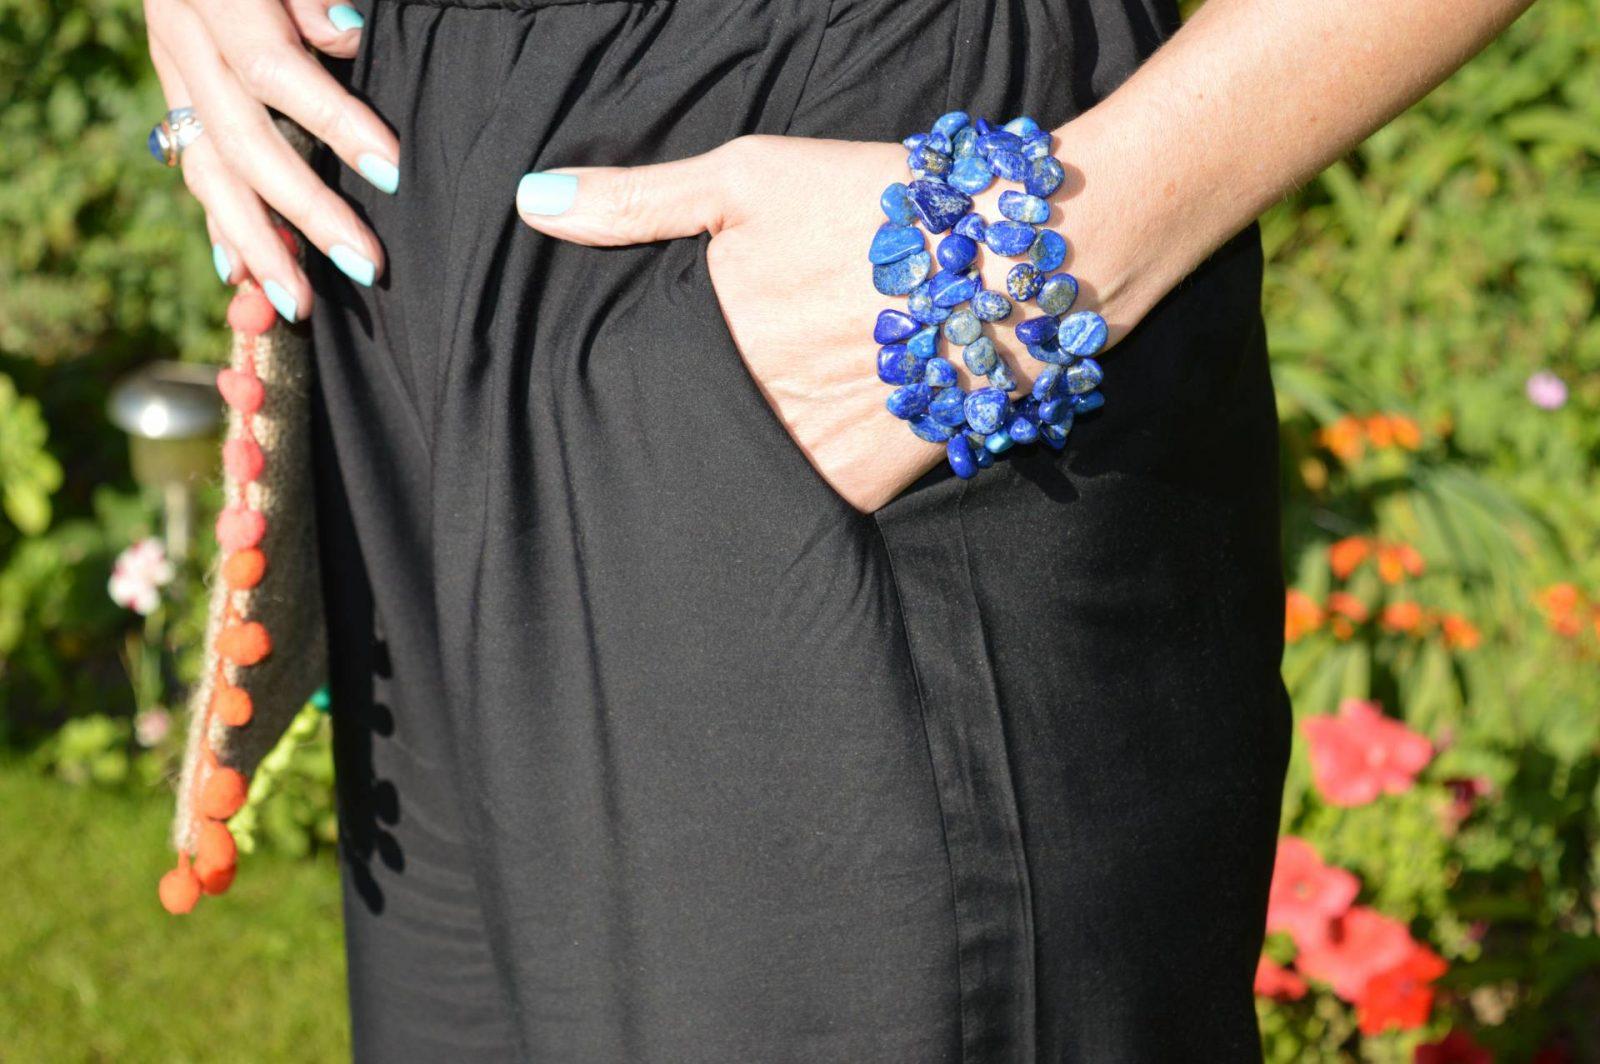 Seafolly Jumpsuit and Hessian Crossbody Pom Pom Bag Pia lapis lazuli bracelet